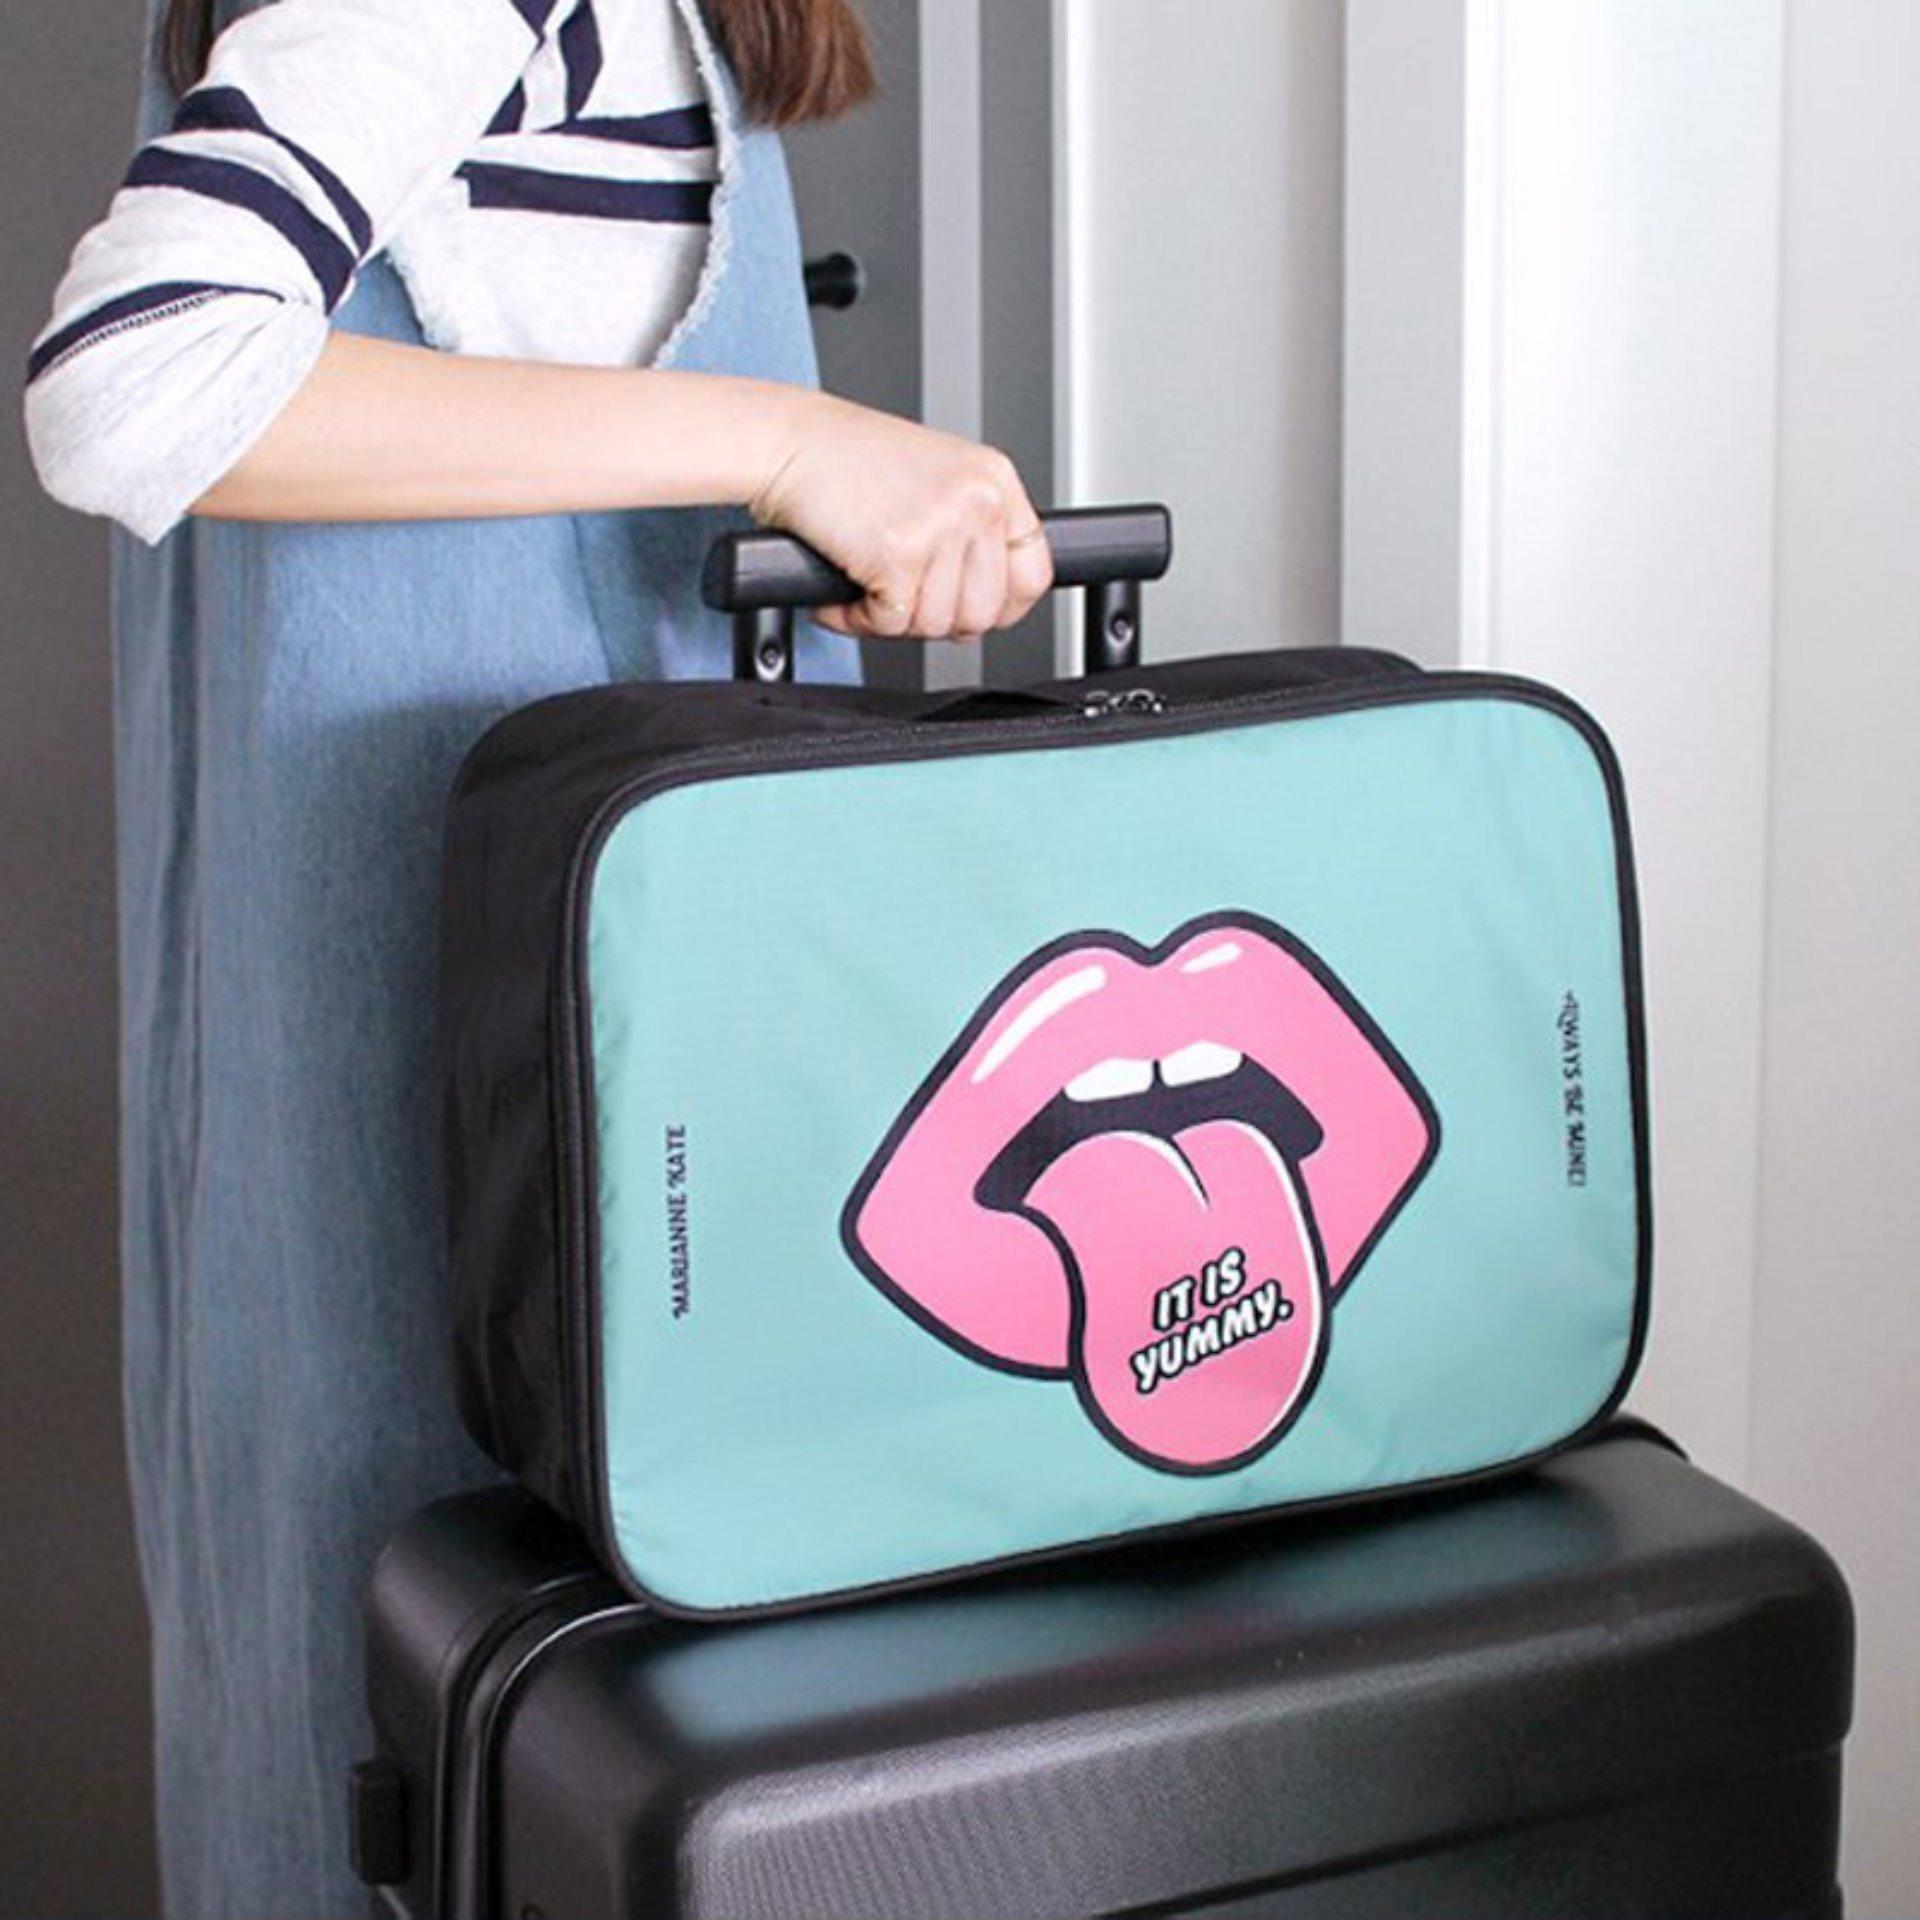 2 Pcs Cute Luggage Bags Waterproof Nylon Travel Totes Storage Bags ...